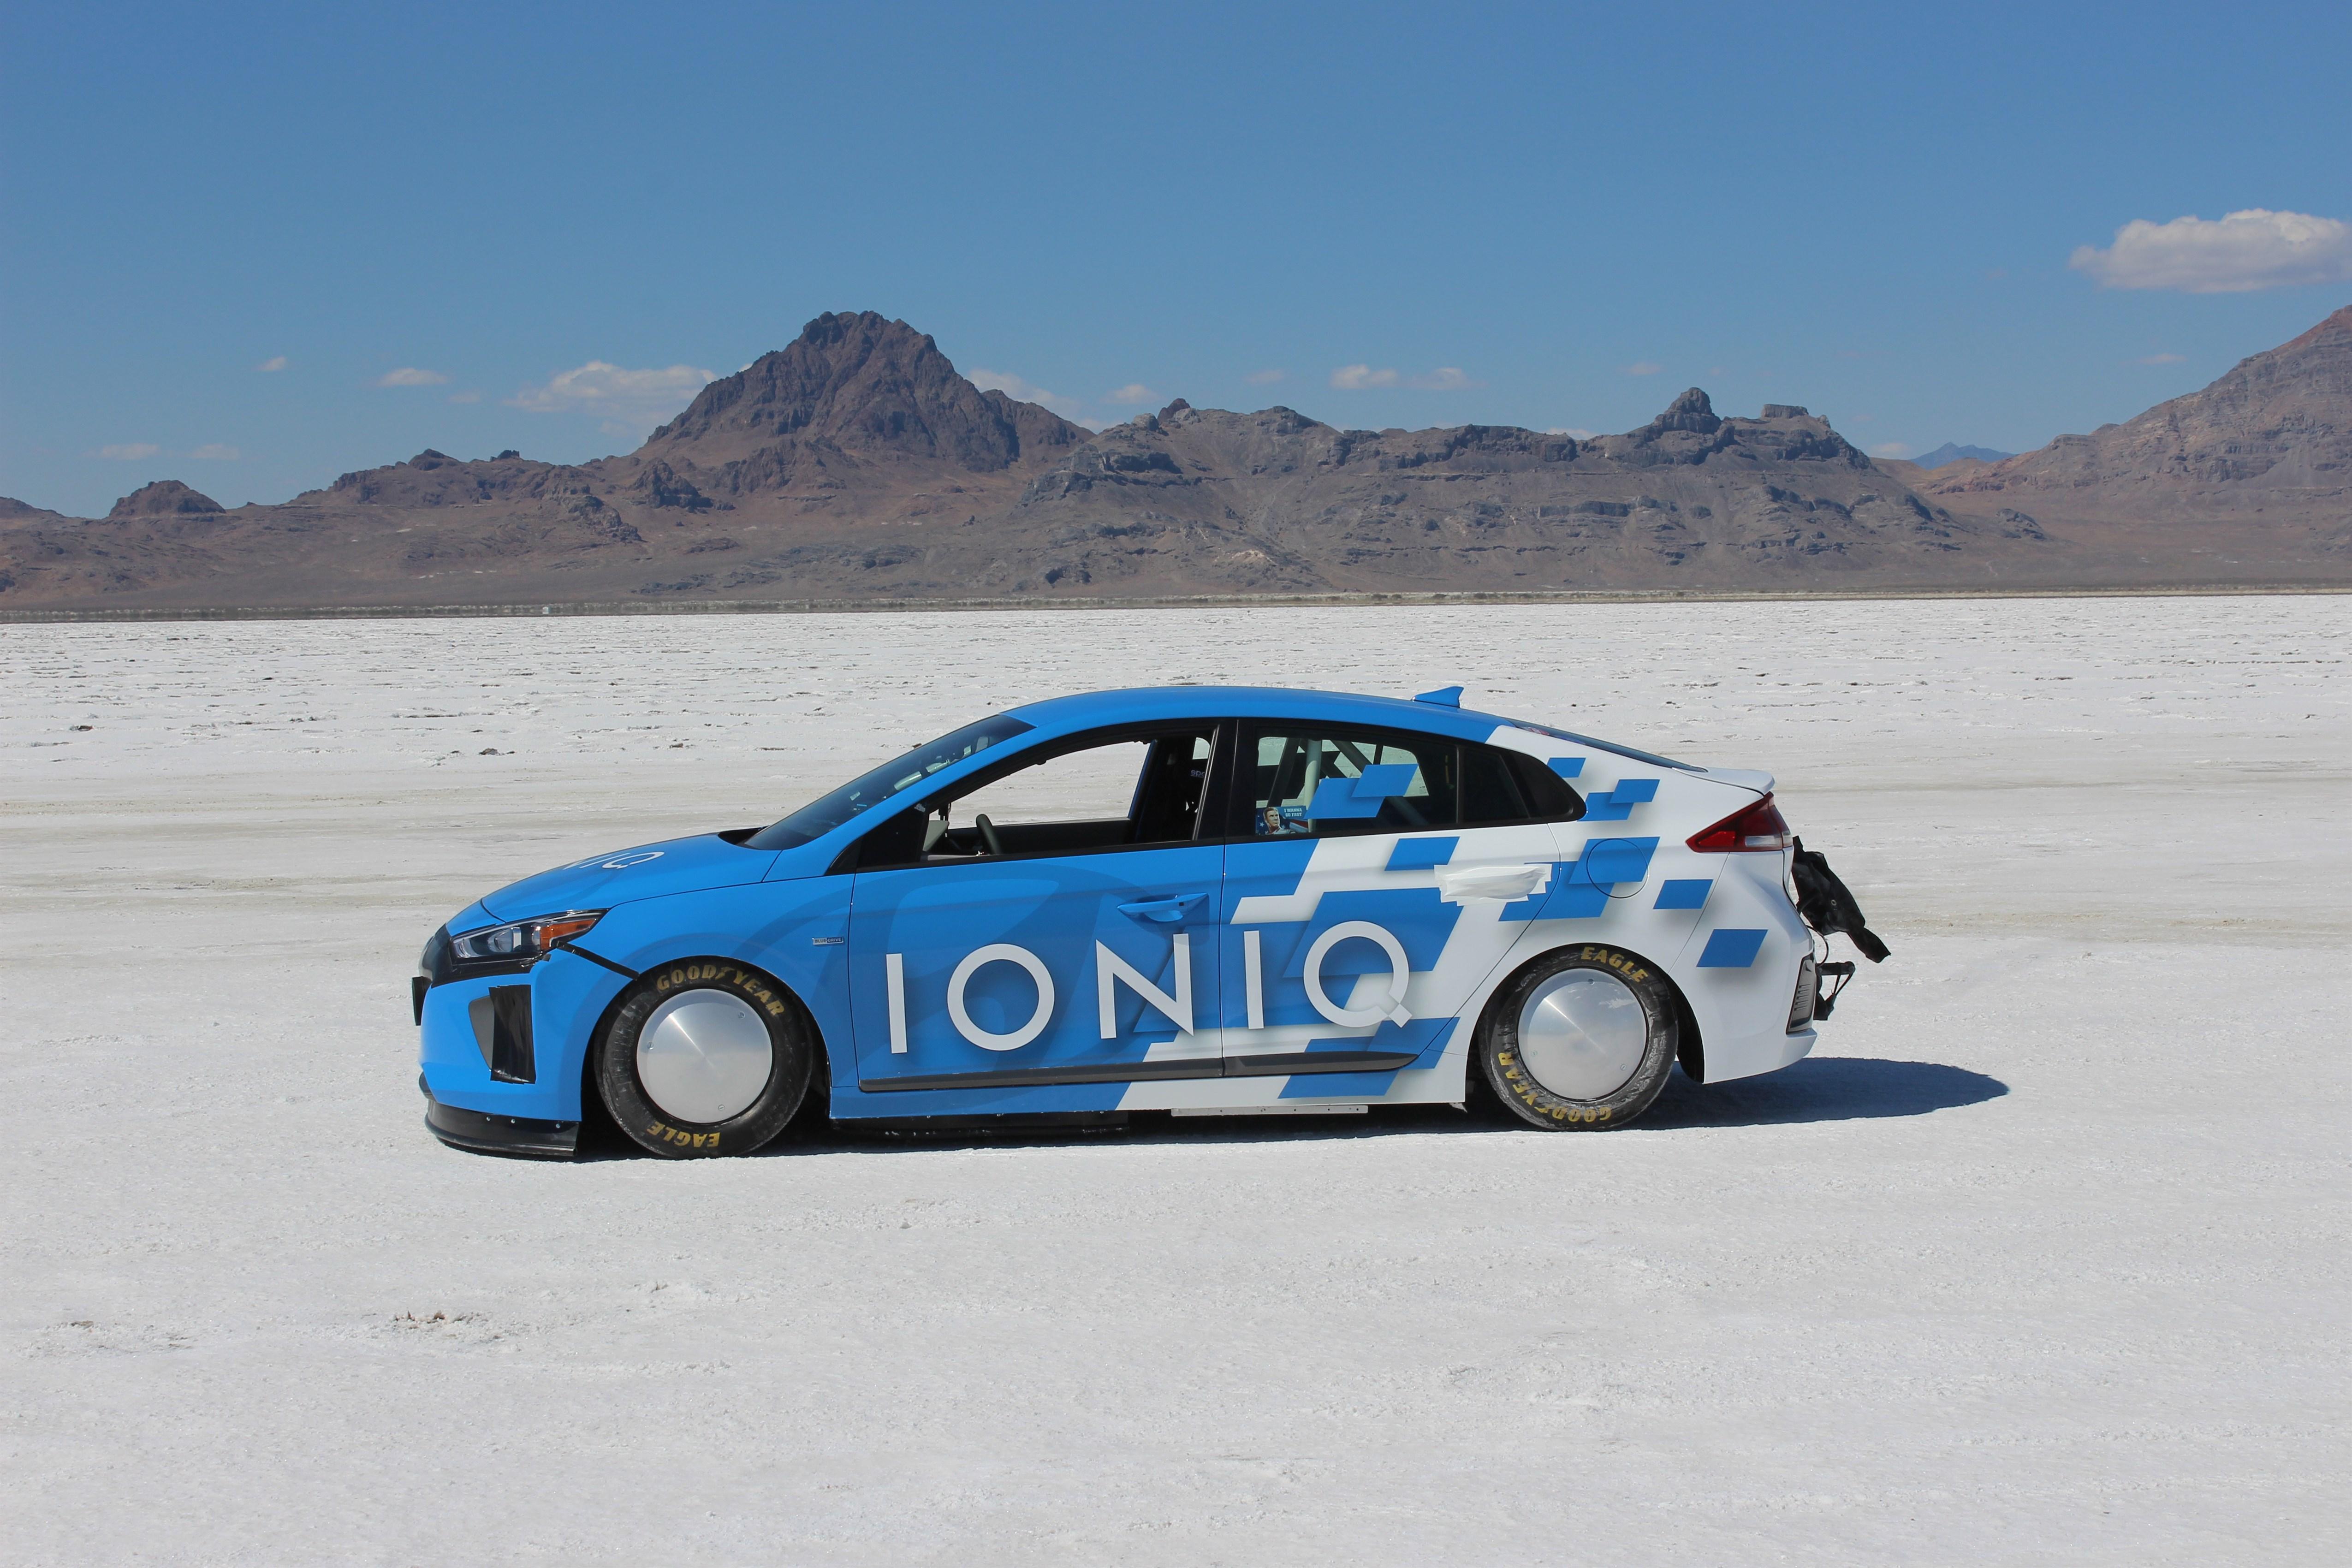 Hyundai'nin Hibrid Modeli Ioniq FIA Onaylı Dünya Hız Rekoru Elde Etti